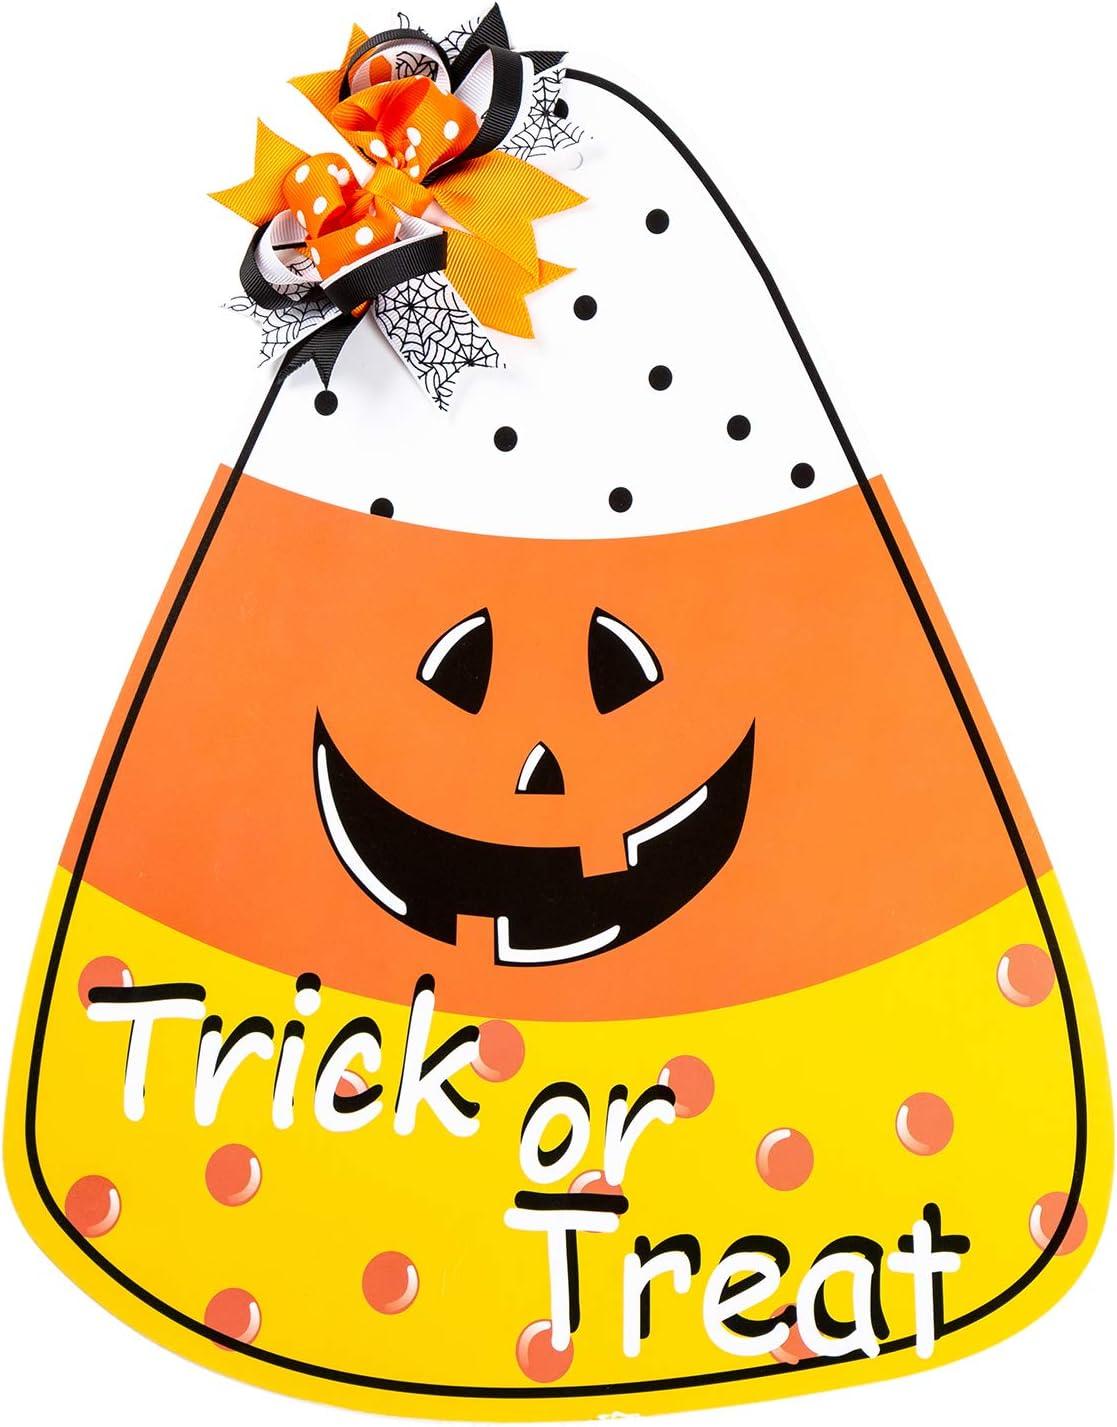 Funnlot Halloween Decor Candy Corn Door Decor Trick or Treat Wreath Hanging Sign Indoor Outdoor Wall Decorations Sign Hanger for Halloween Party Supplies Decorations